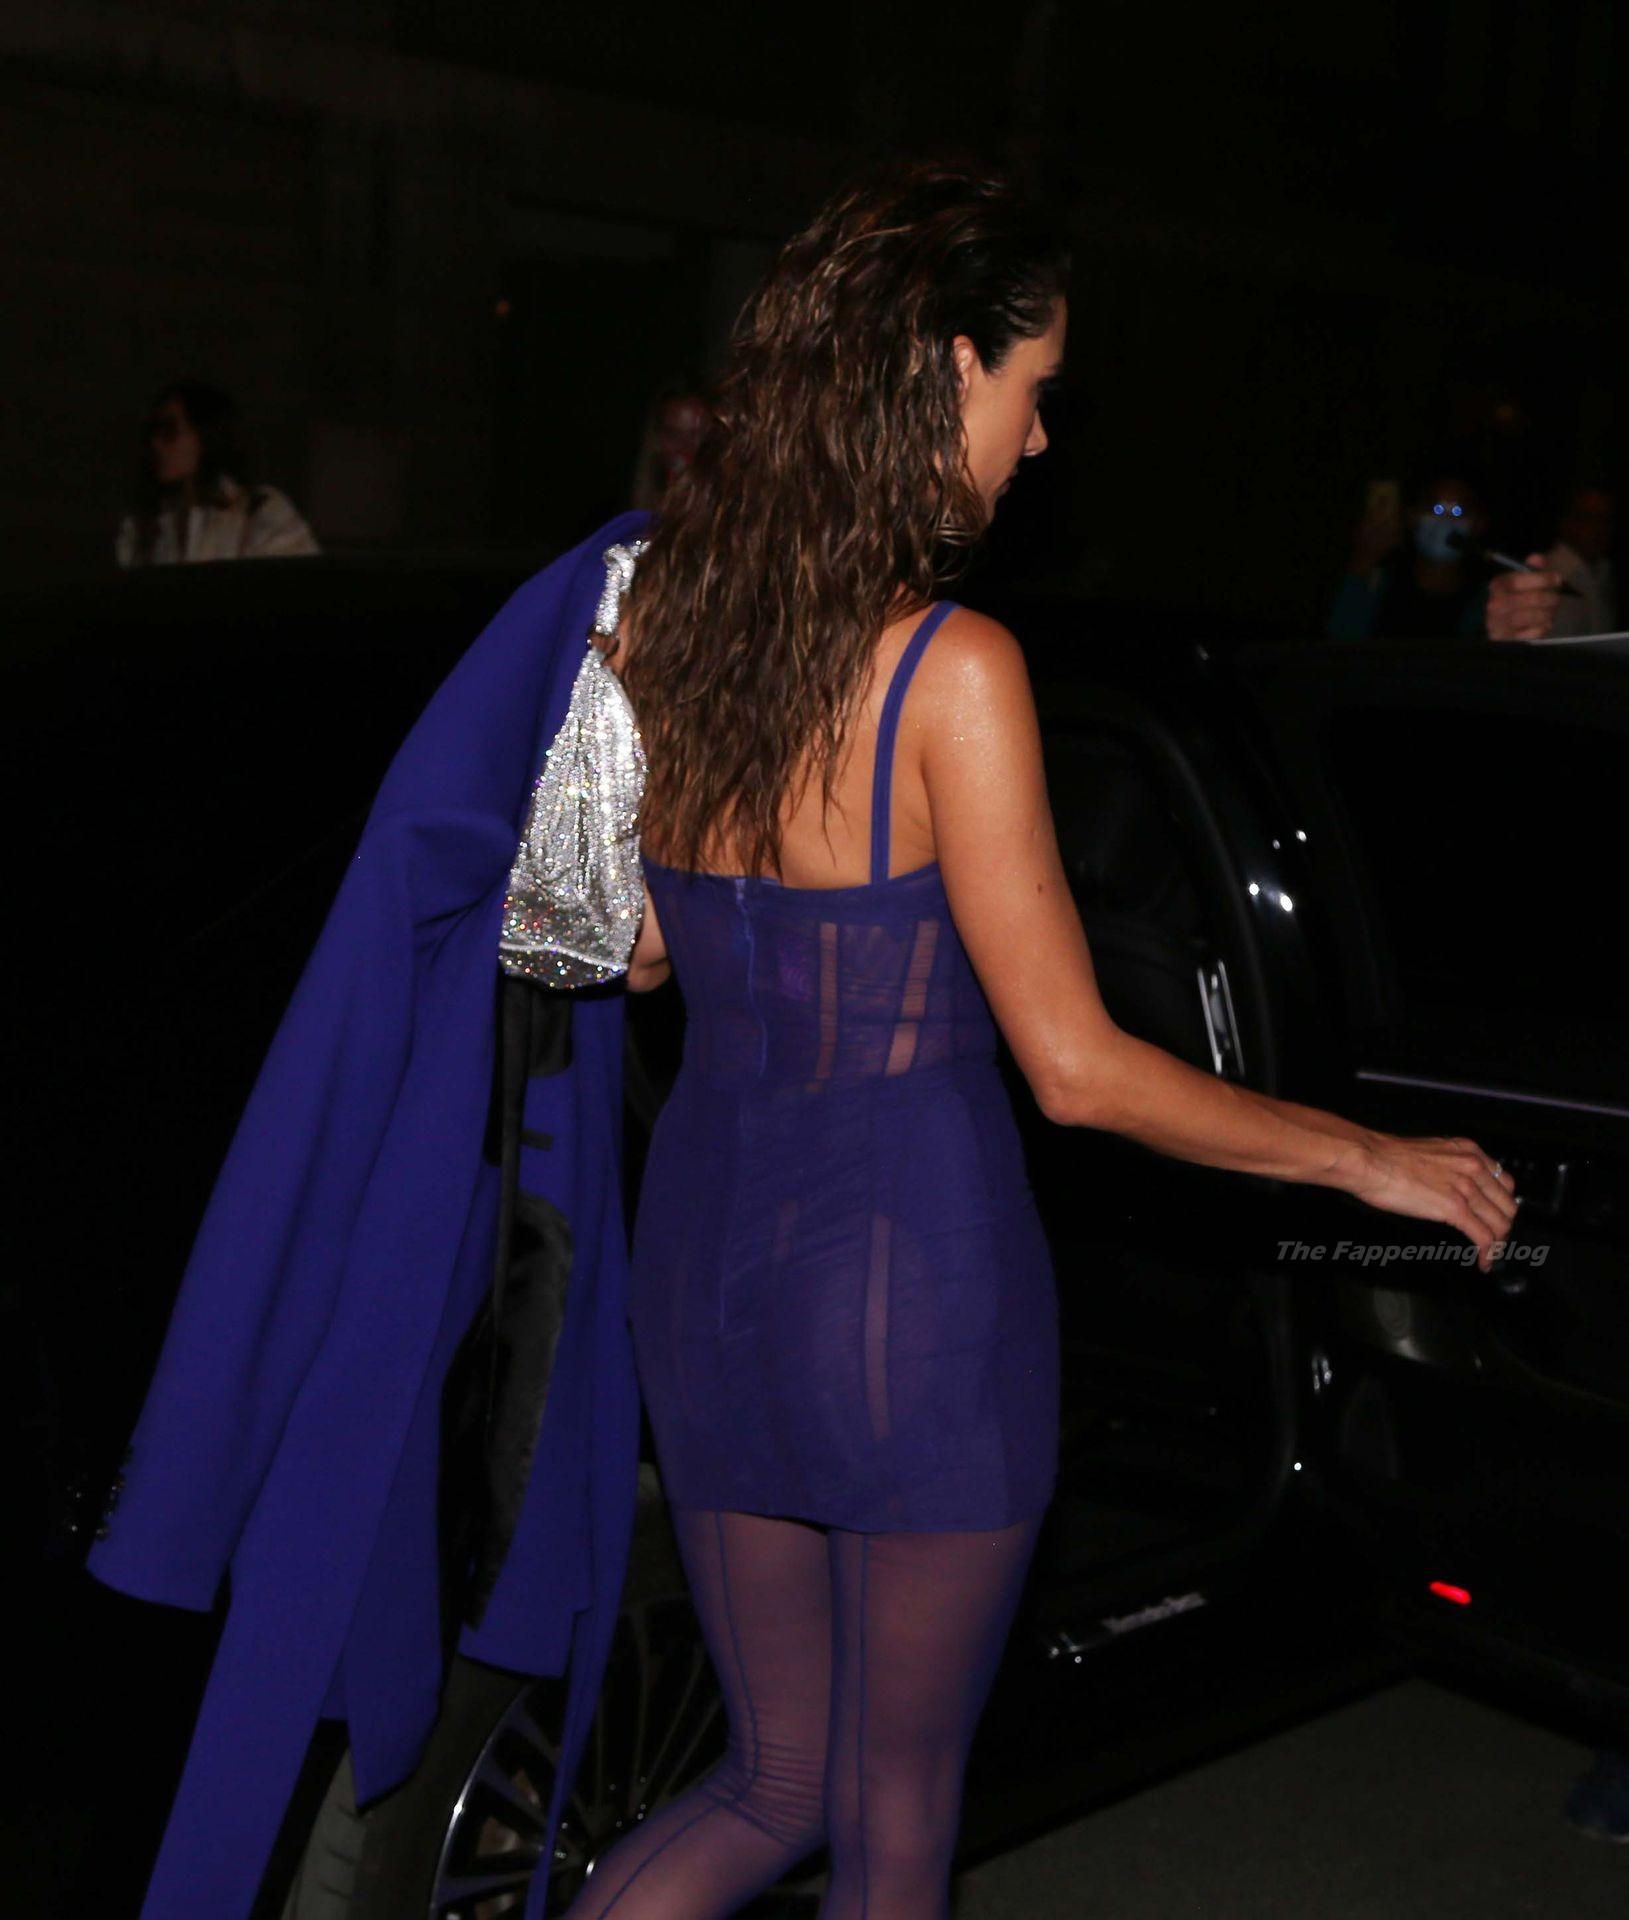 Alessandra-Ambrosio-Sexy-The-Fappening-Blog-37-2.jpg